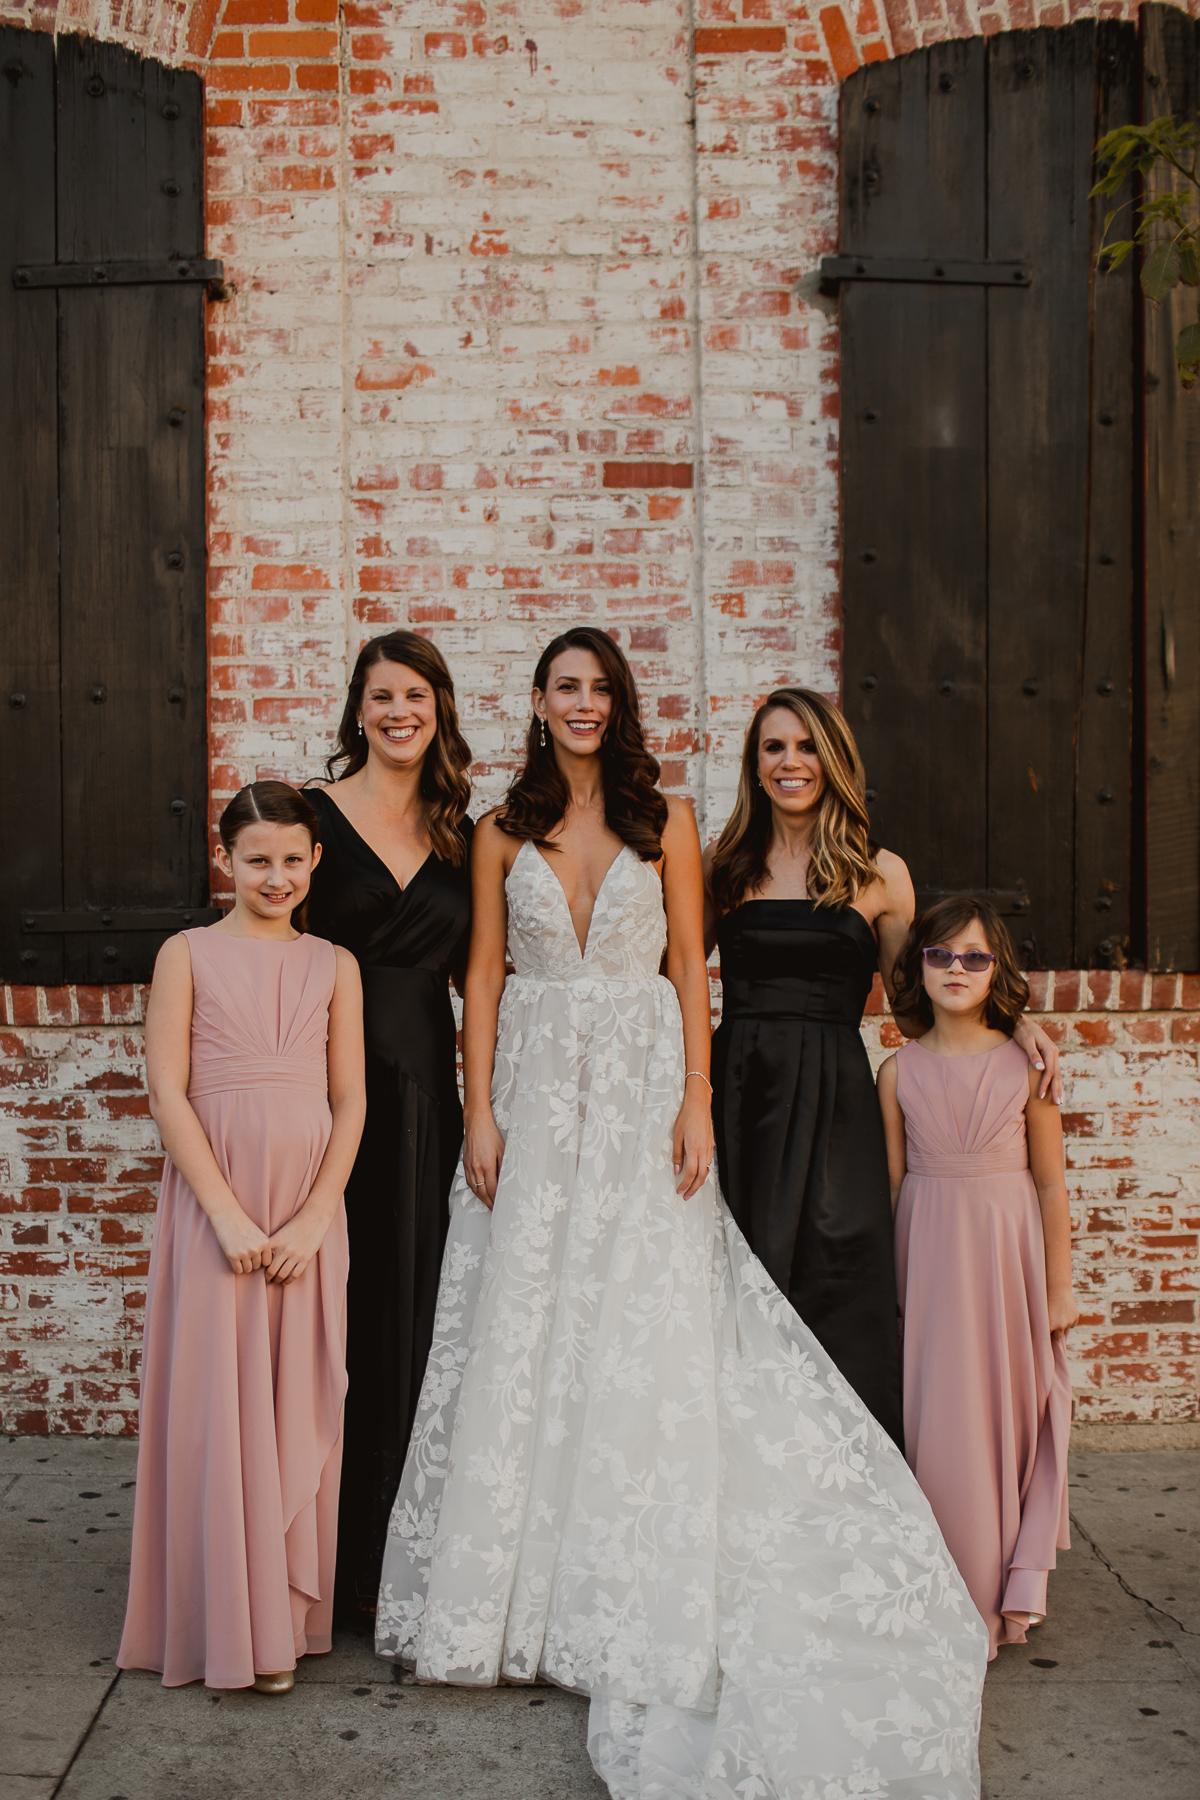 carondelet-house-kelley-raye-los-angeles-wedding-photographer-48.jpg